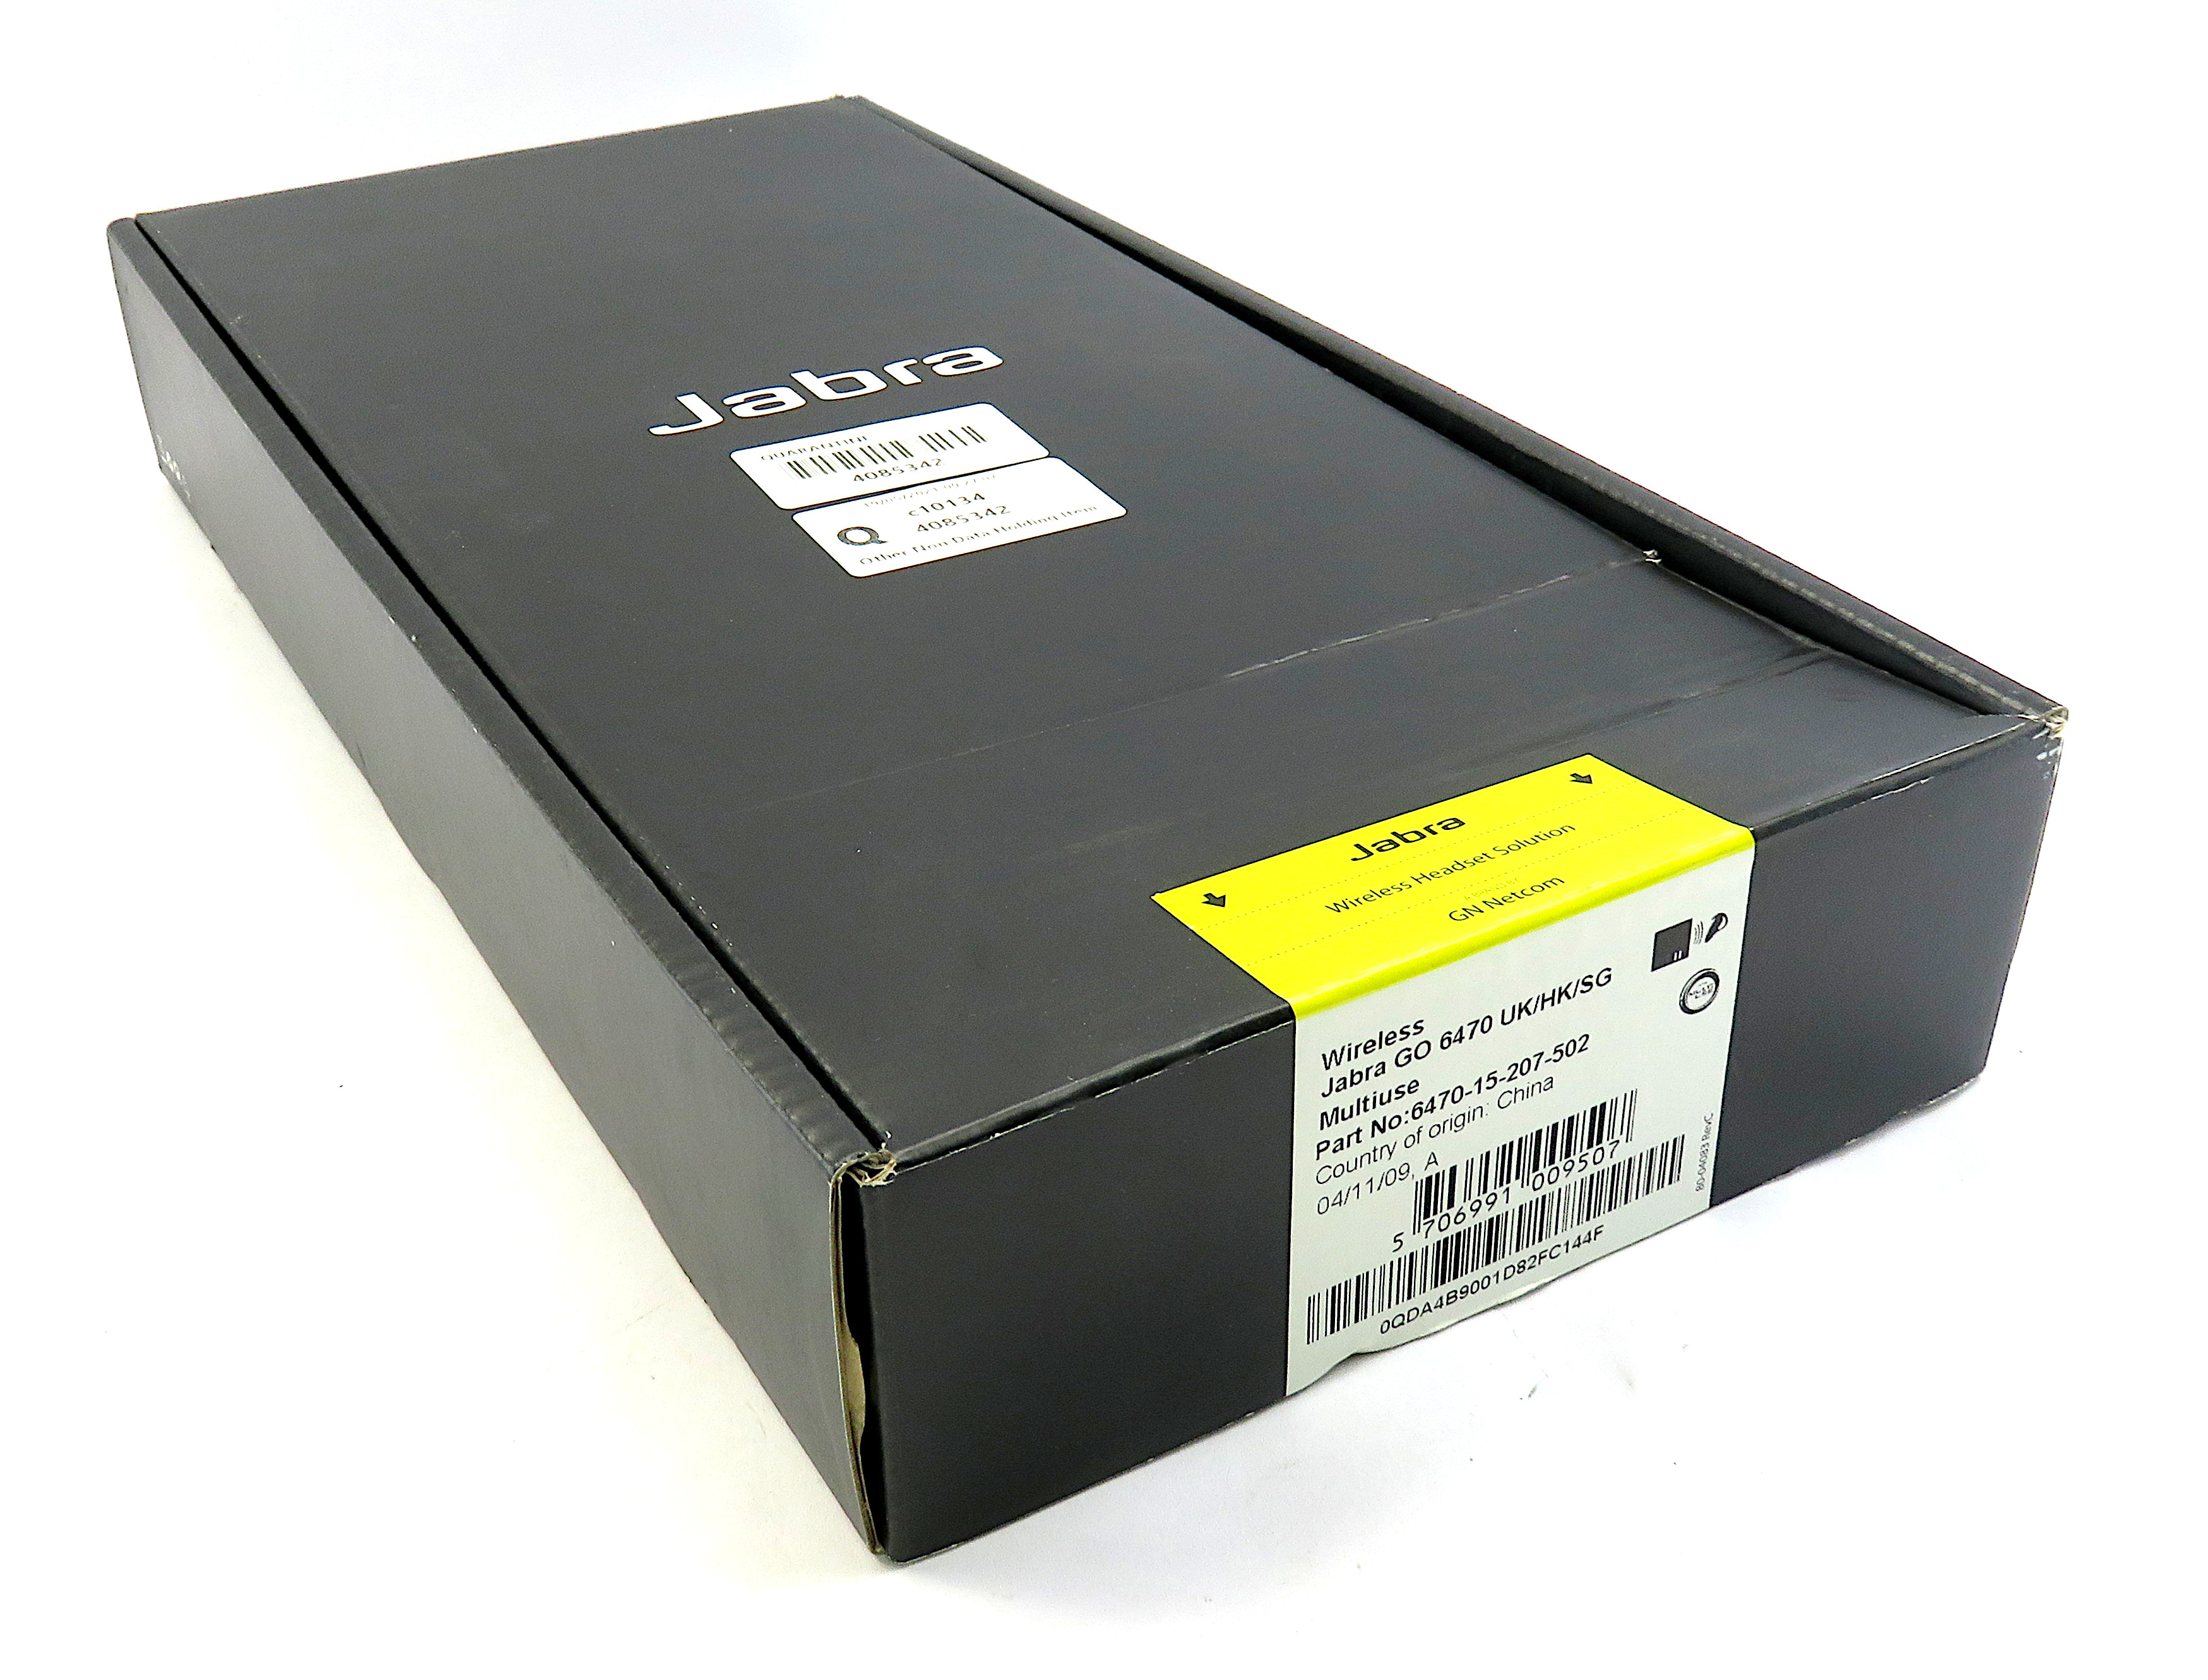 Jabra Go 6470 UK/HK/SG Wireless Bluetooth Headset - 6470-15-207-502 - New